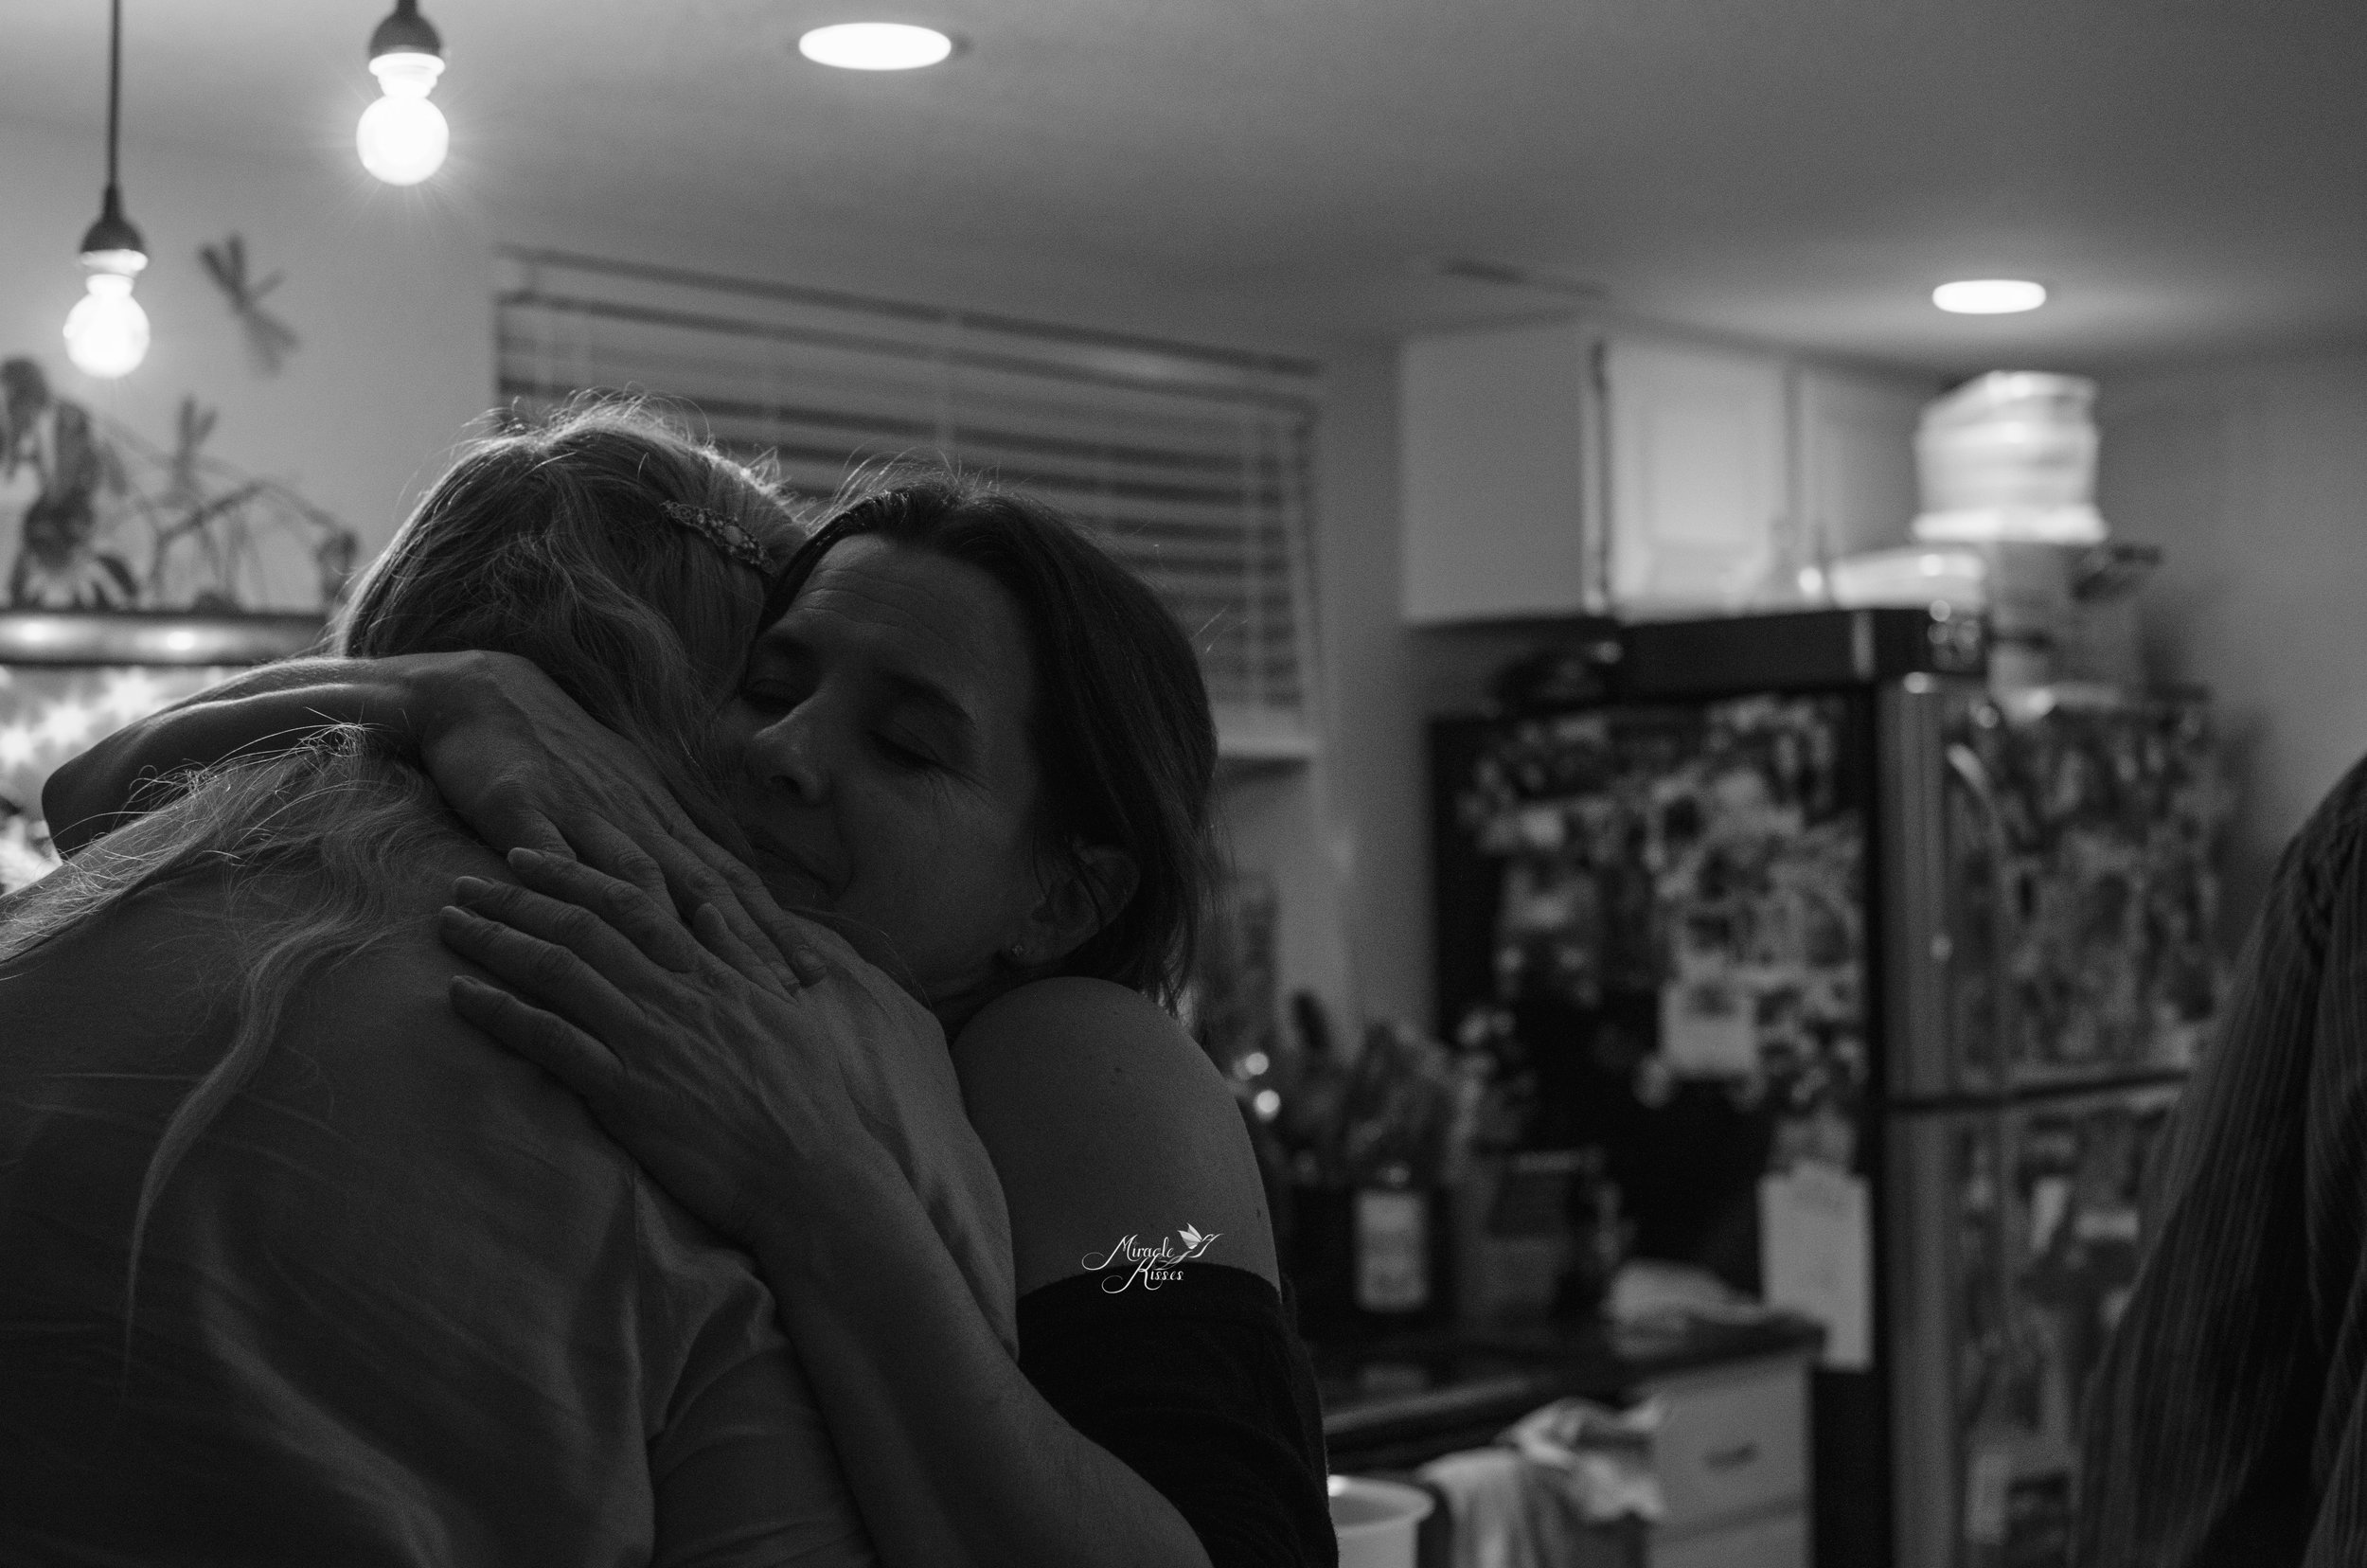 embrace, hug, love and goodbye